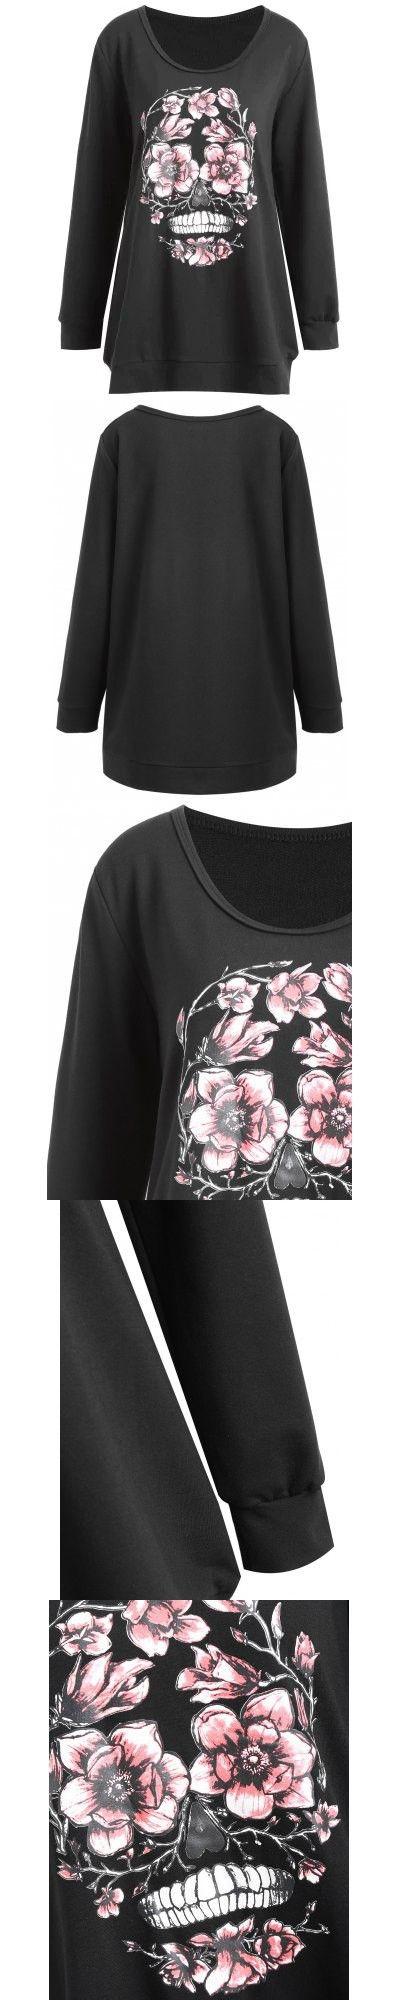 Black Plus Size Halloween Skull Floral Print Sweatshirt 2XL-$22.6